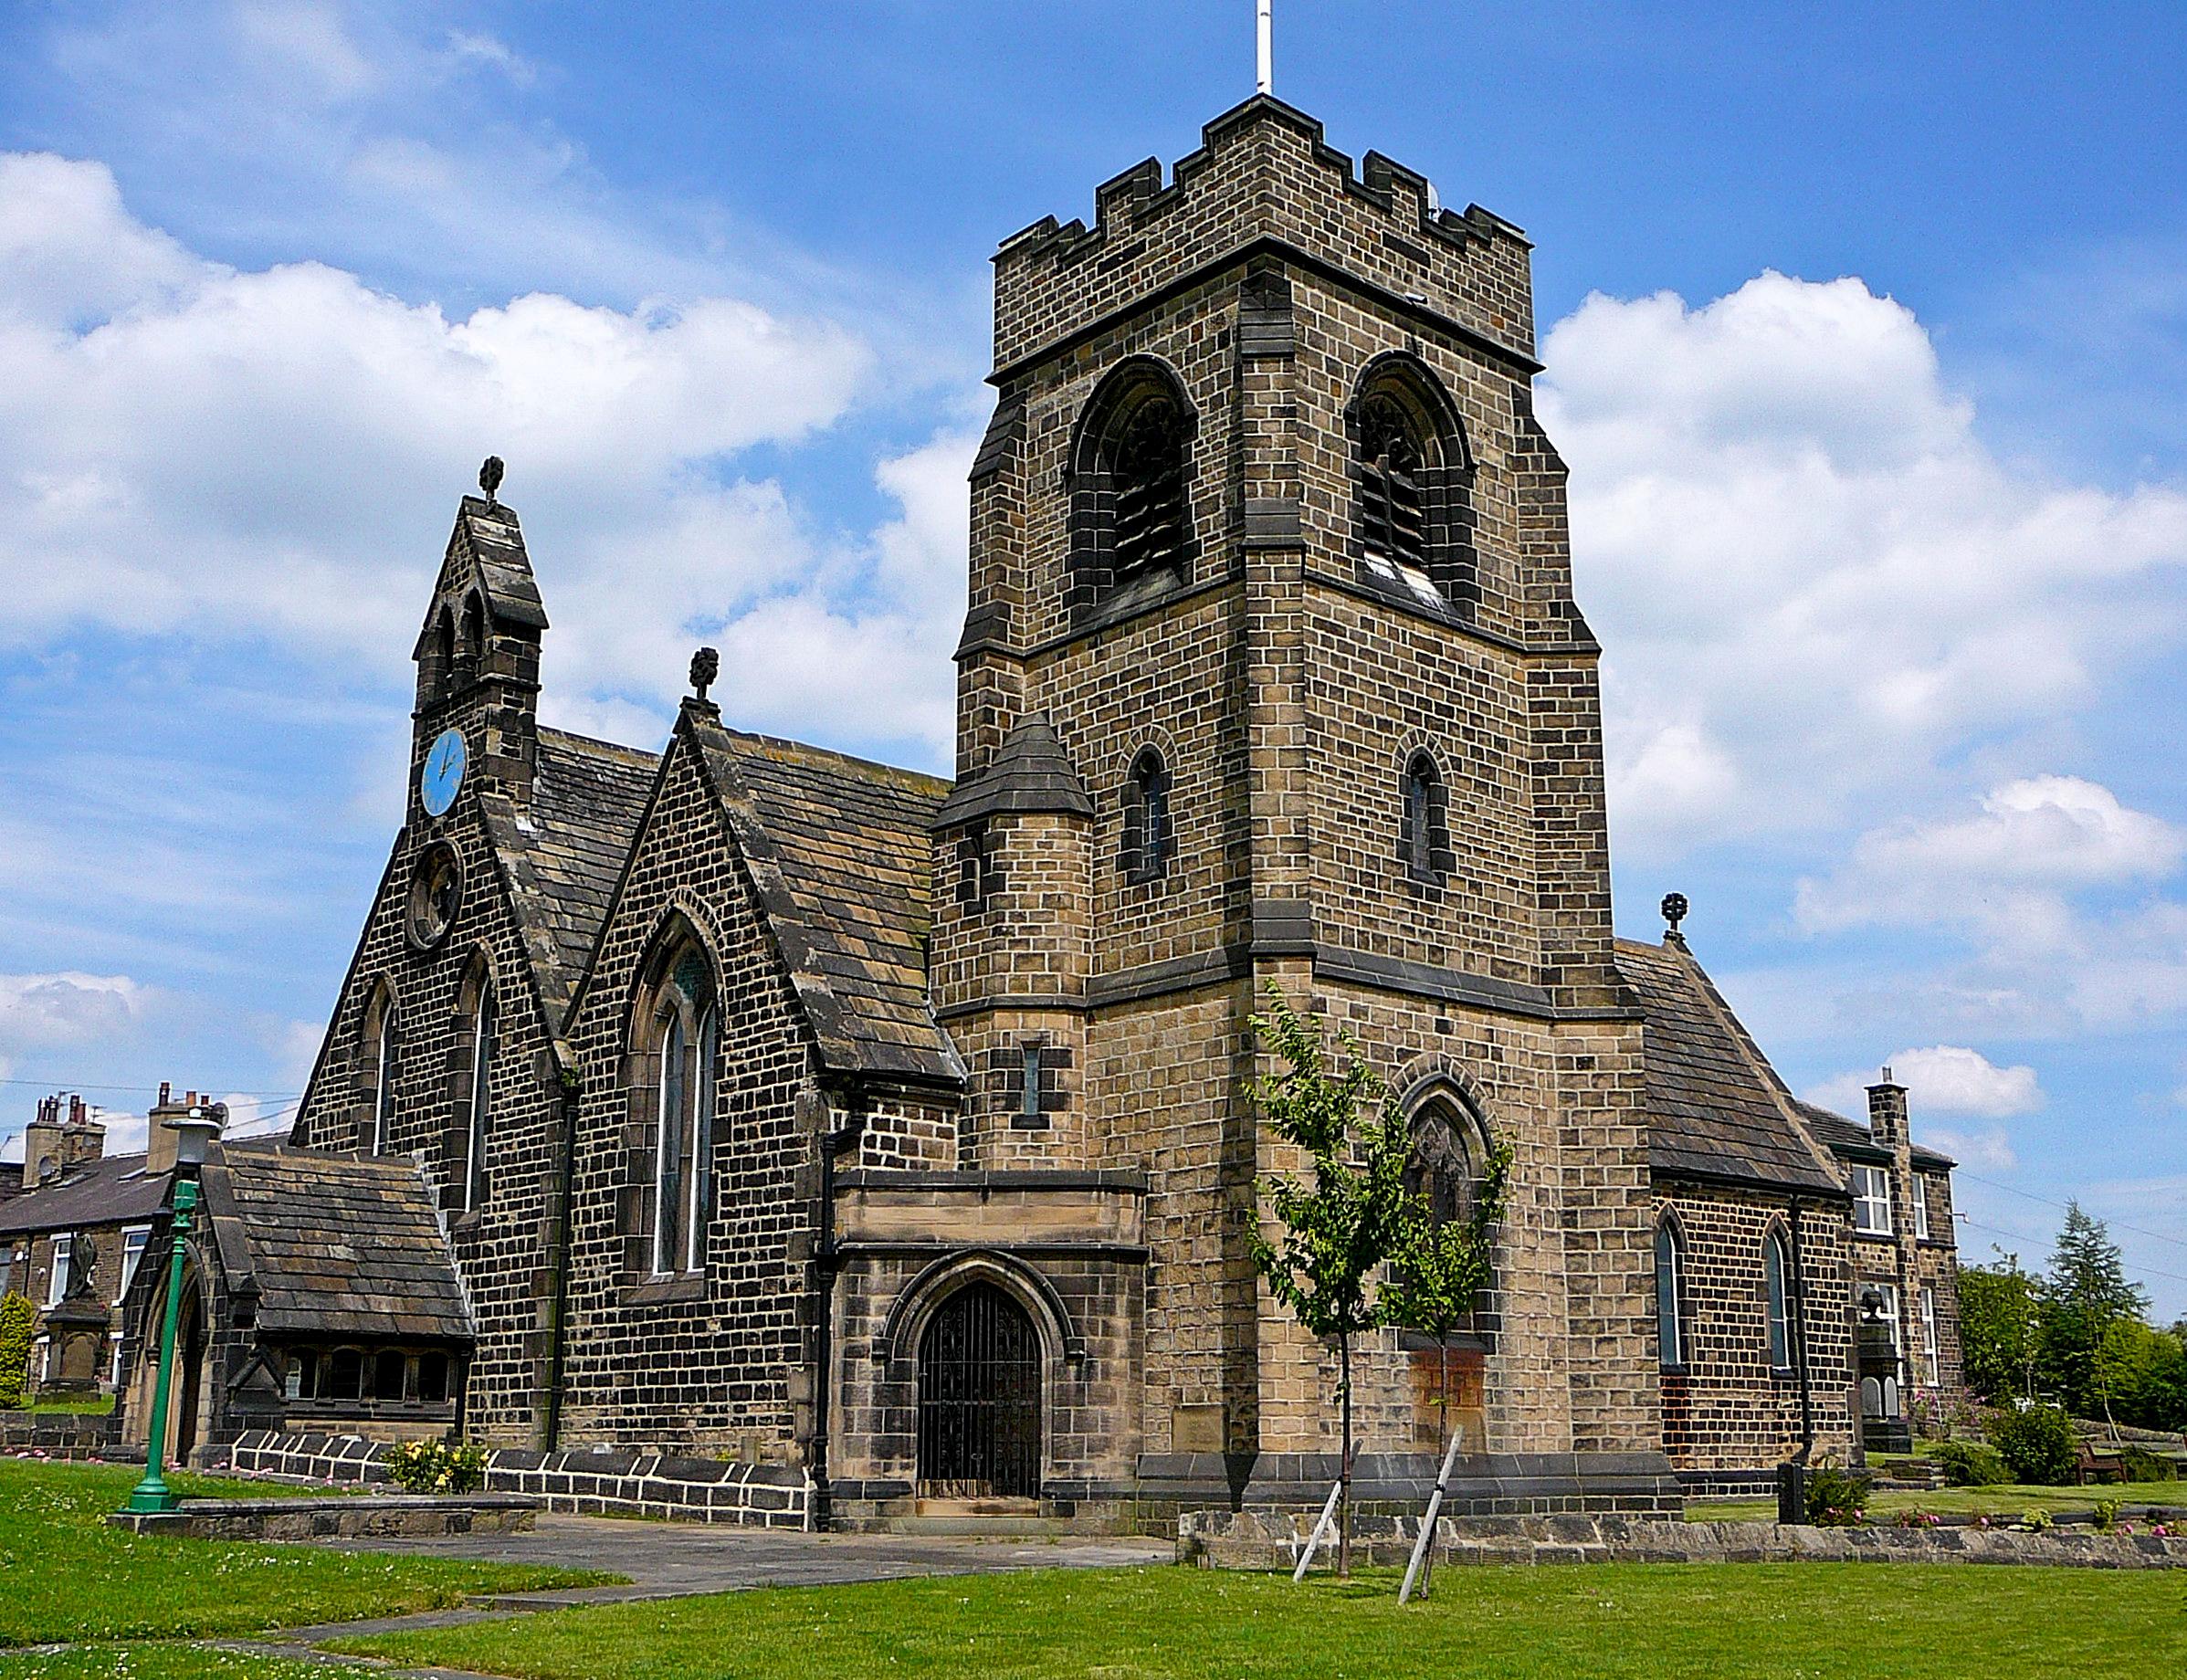 File:Baildon Parish Church (2639091161).jpg - Wikimedia Commons